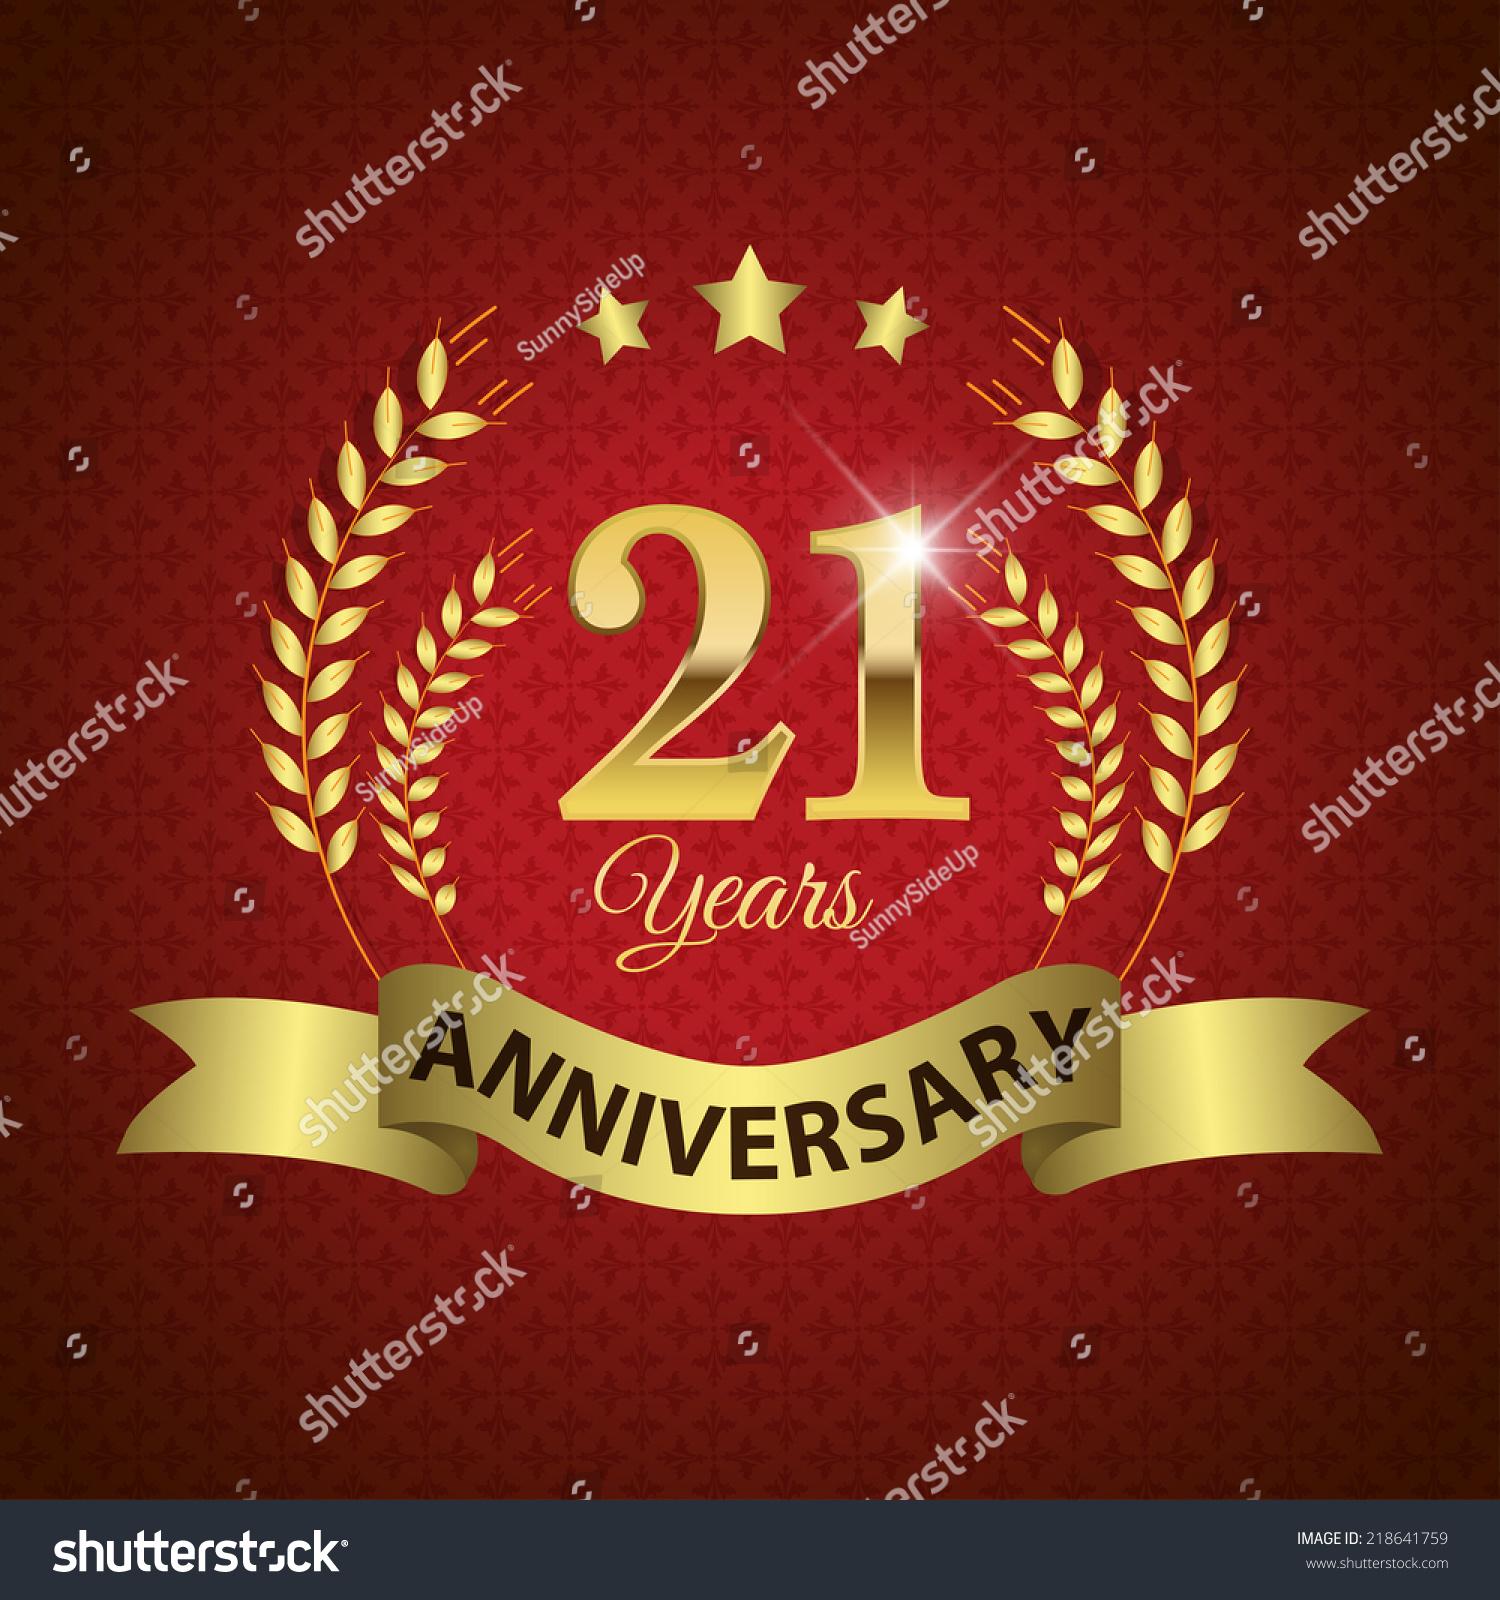 Celebrating 21 Years Anniversary Golden Laurel Stock Vector (Royalty ...